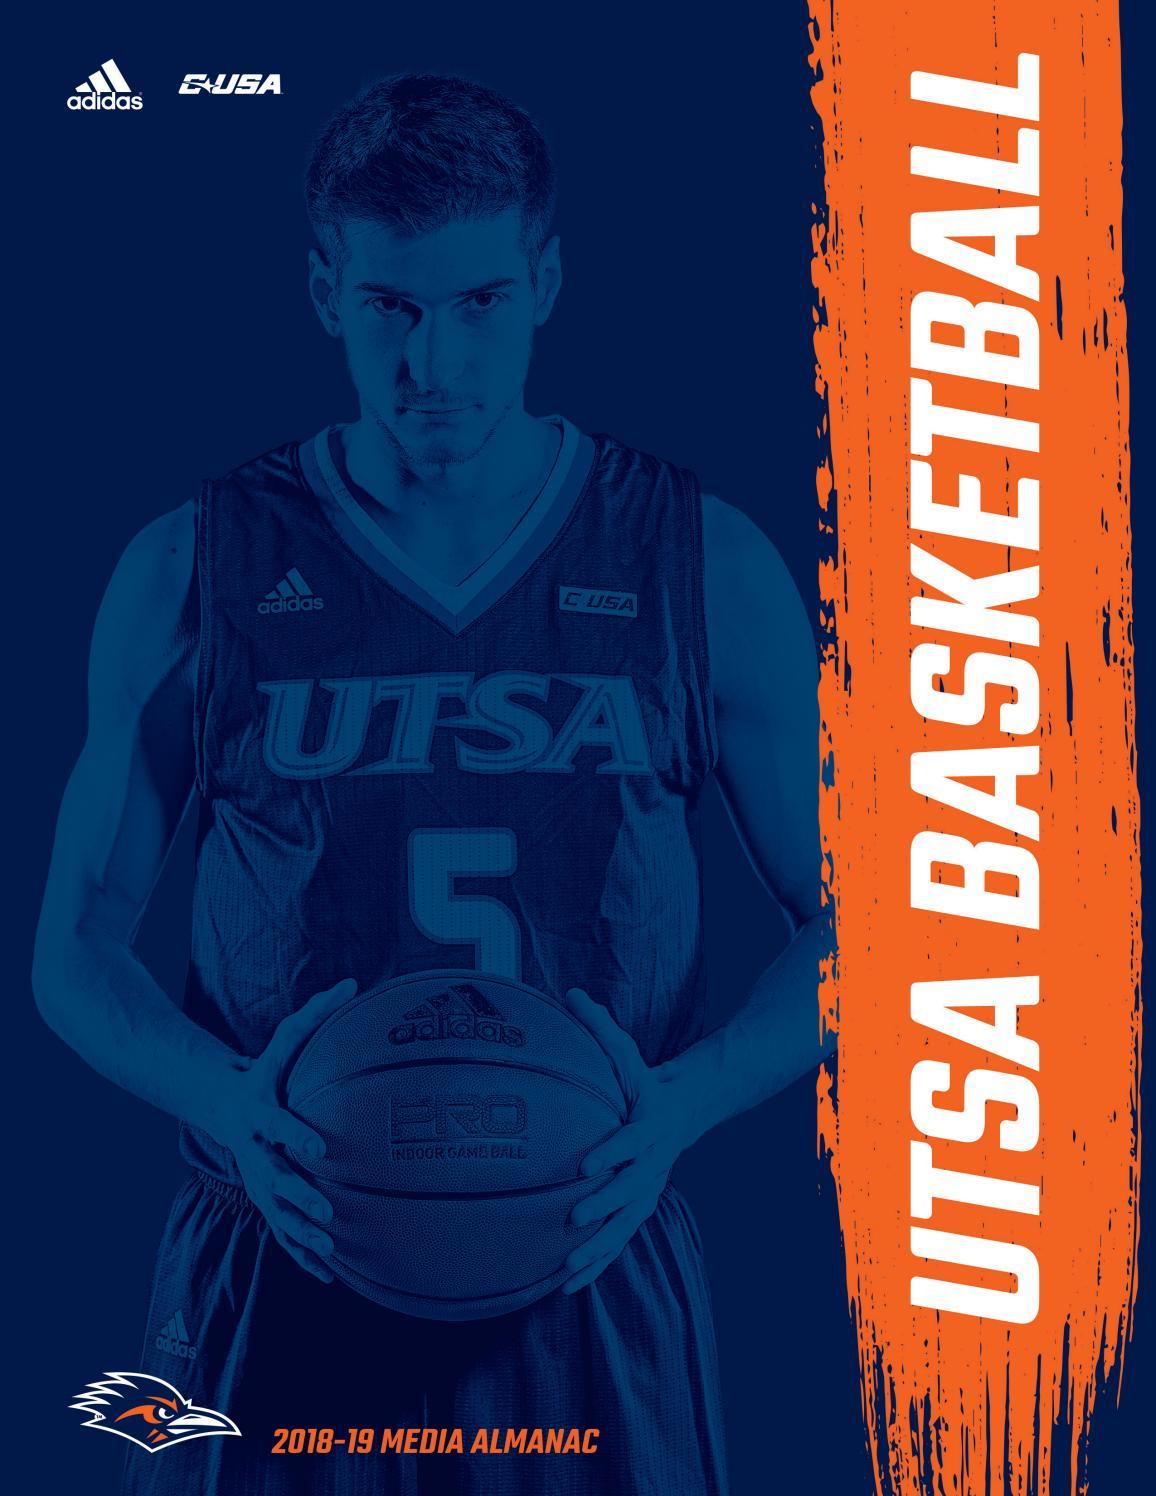 2018-19 UTSA Men s Basketball Media Almanac by UTSA Athletics  Communications - issuu 097f84b29